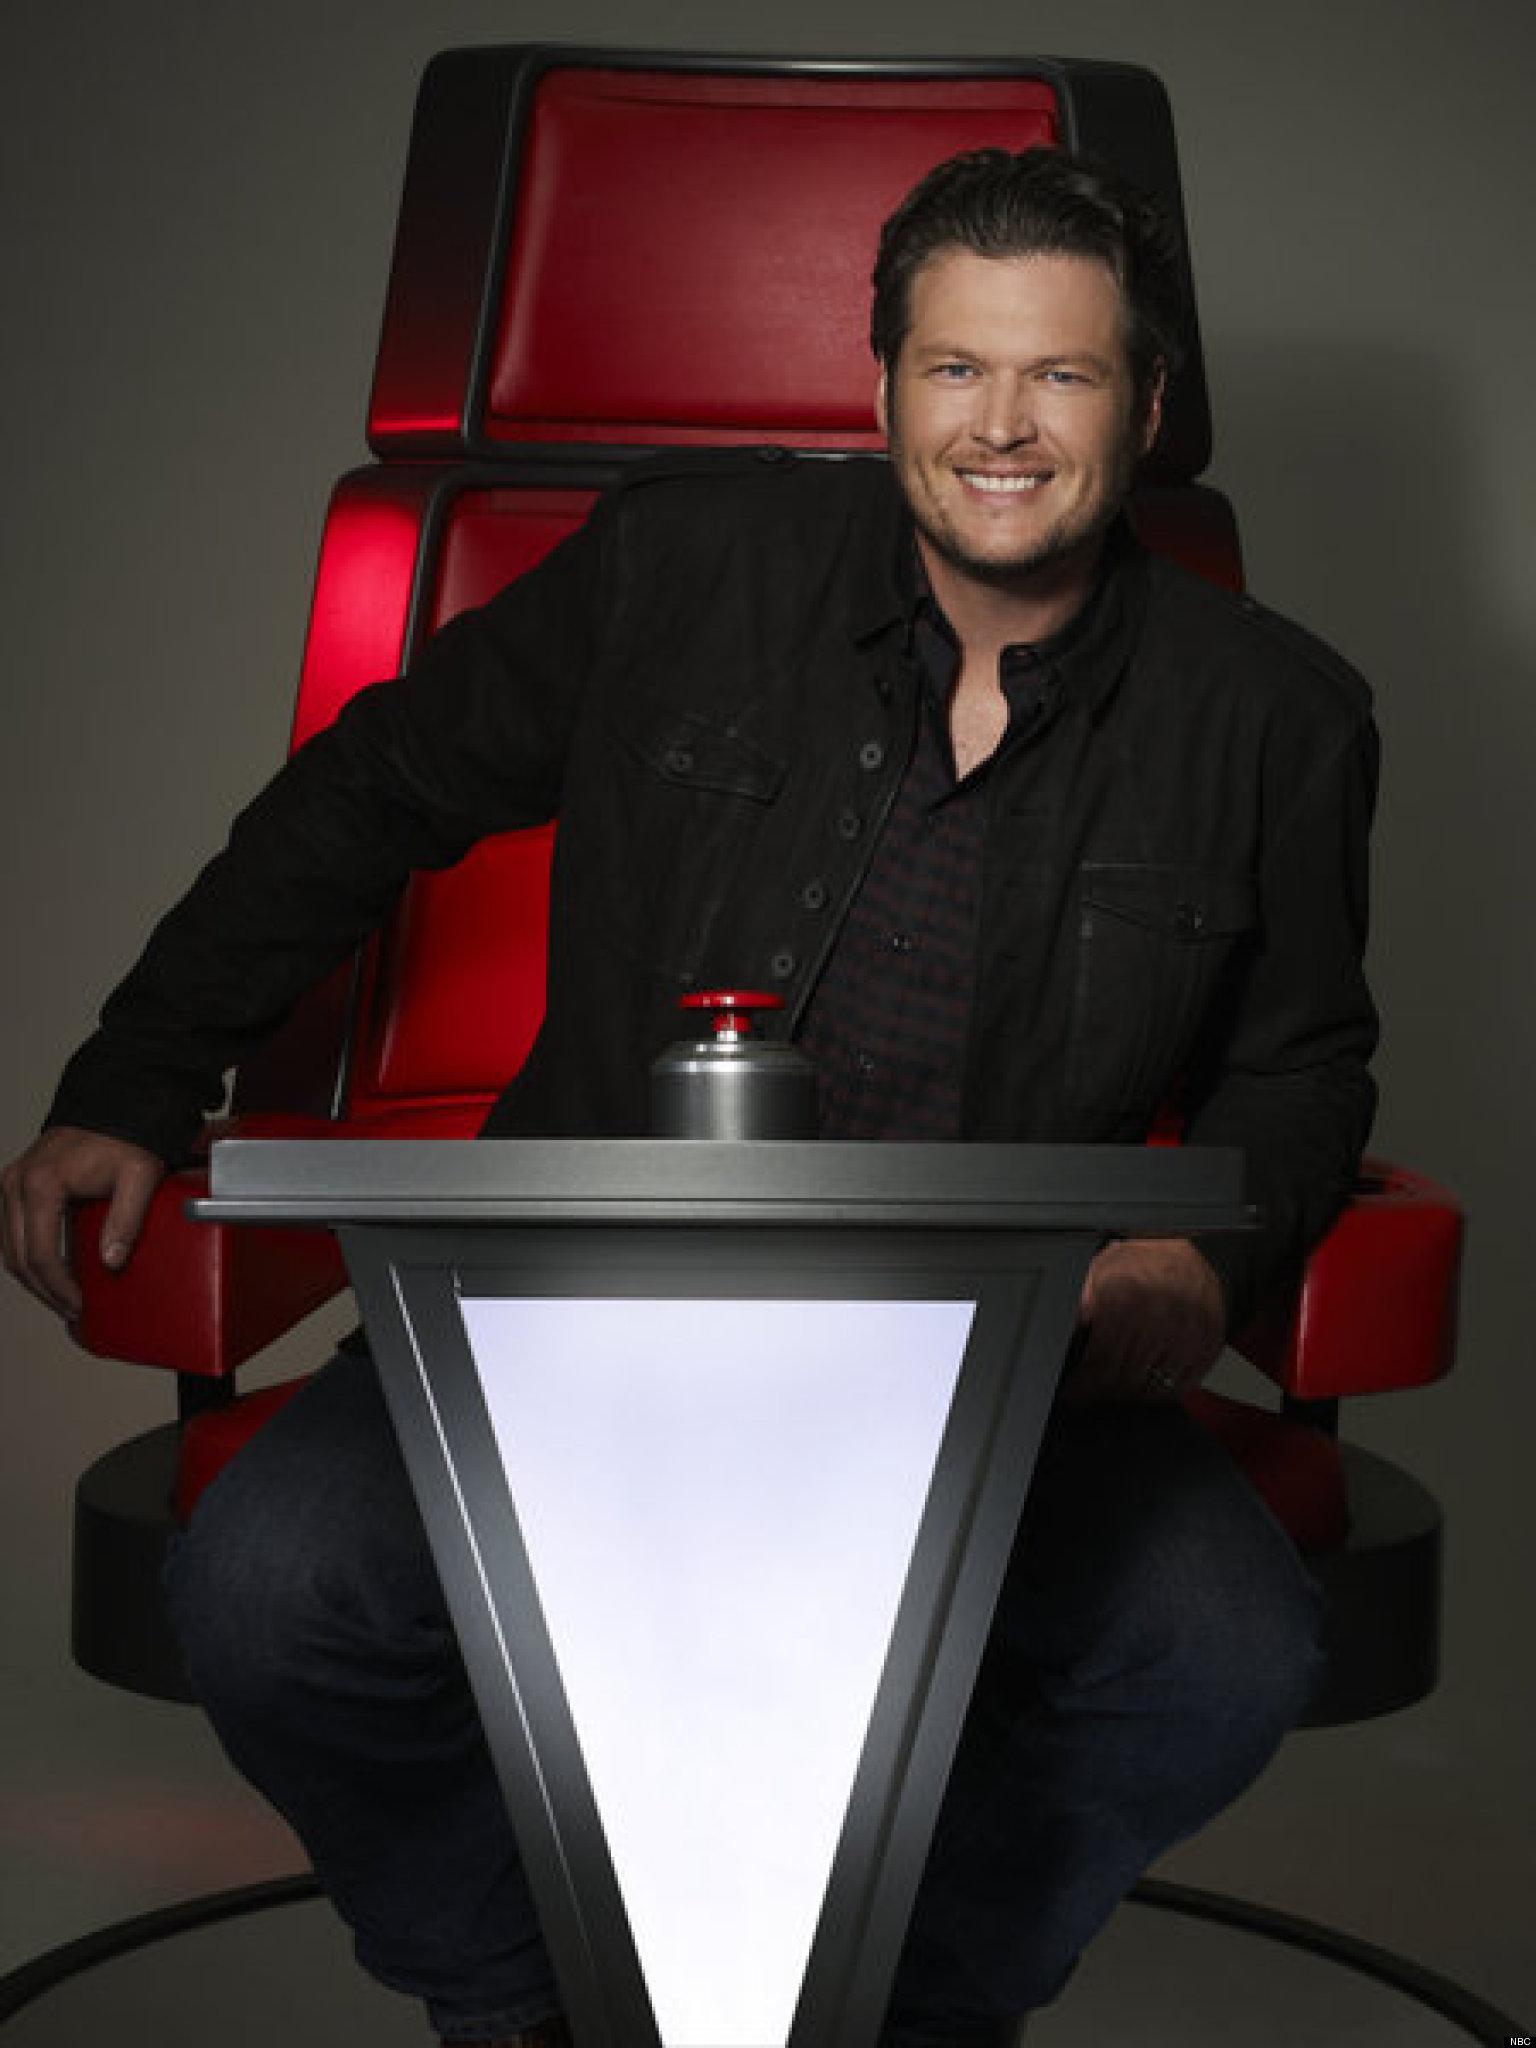 The Voice Within The Cards: 'The Voice': Blake Shelton On Shakira And Usher, Season 4